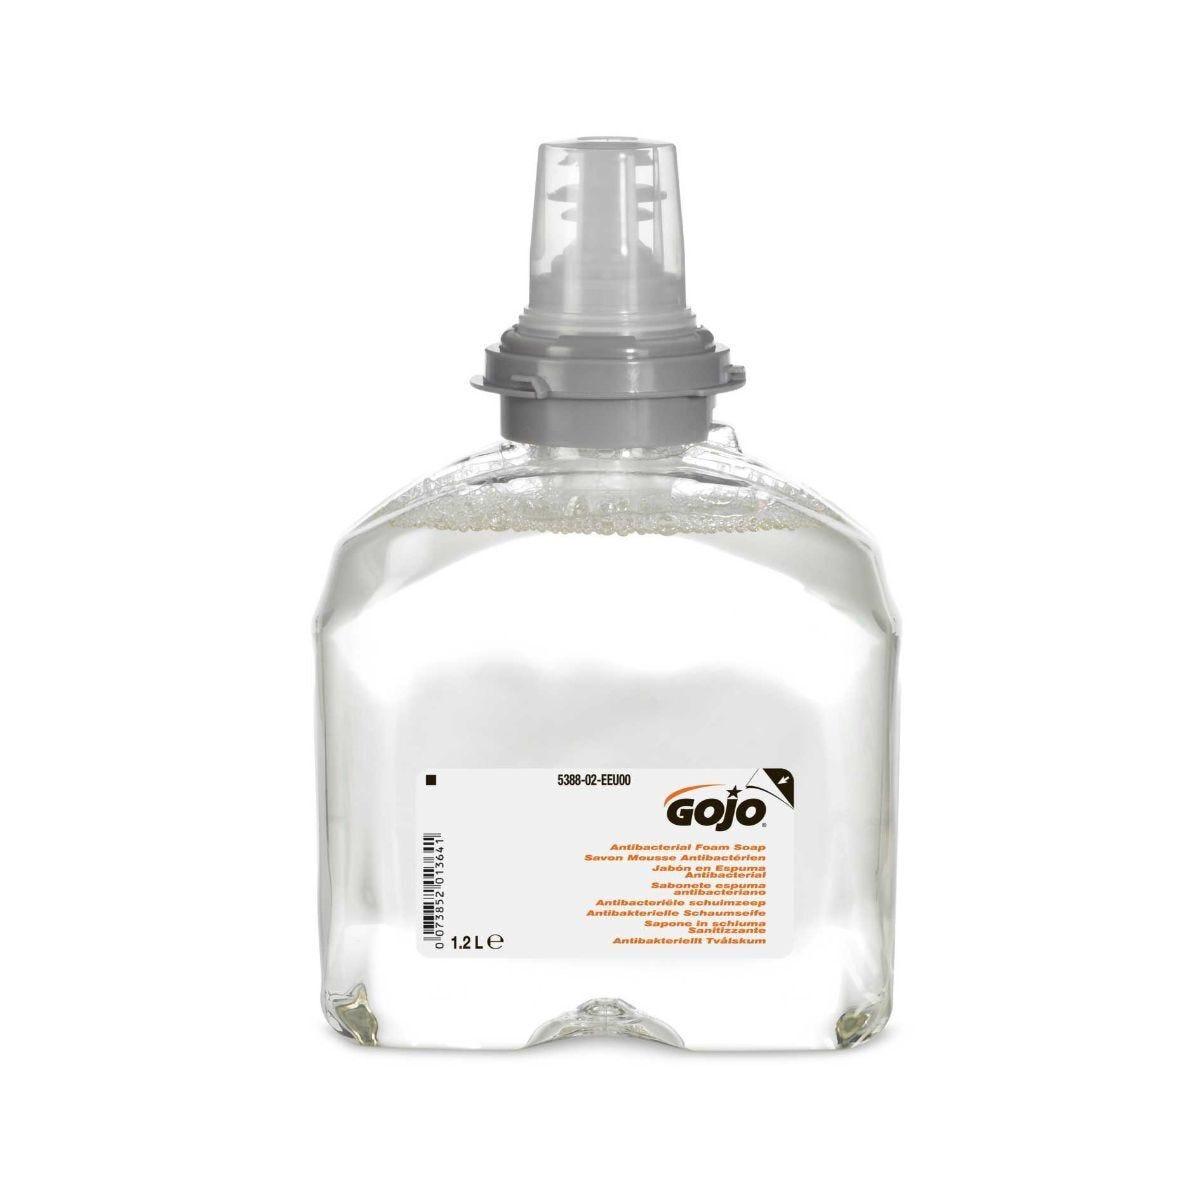 Gojo Antibacterial Foam Soap 2 x 1.2 Litre